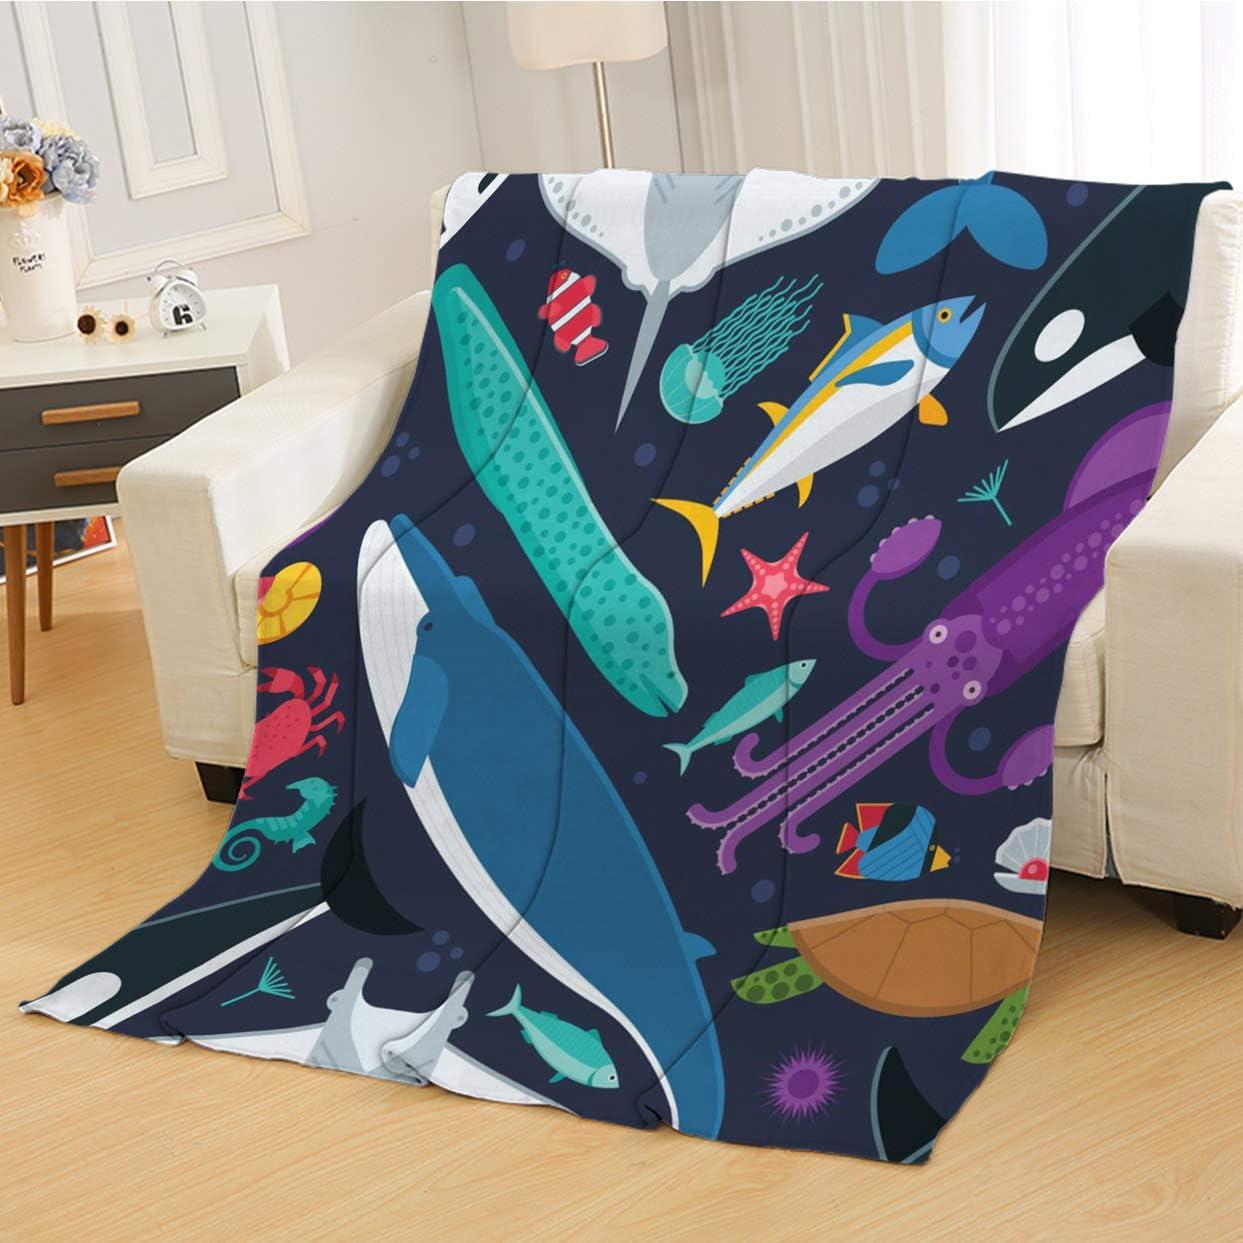 RLDSESS Children Warm Ranking TOP4 Queen Bed Soft Weighted C Blanket Max 54% OFF